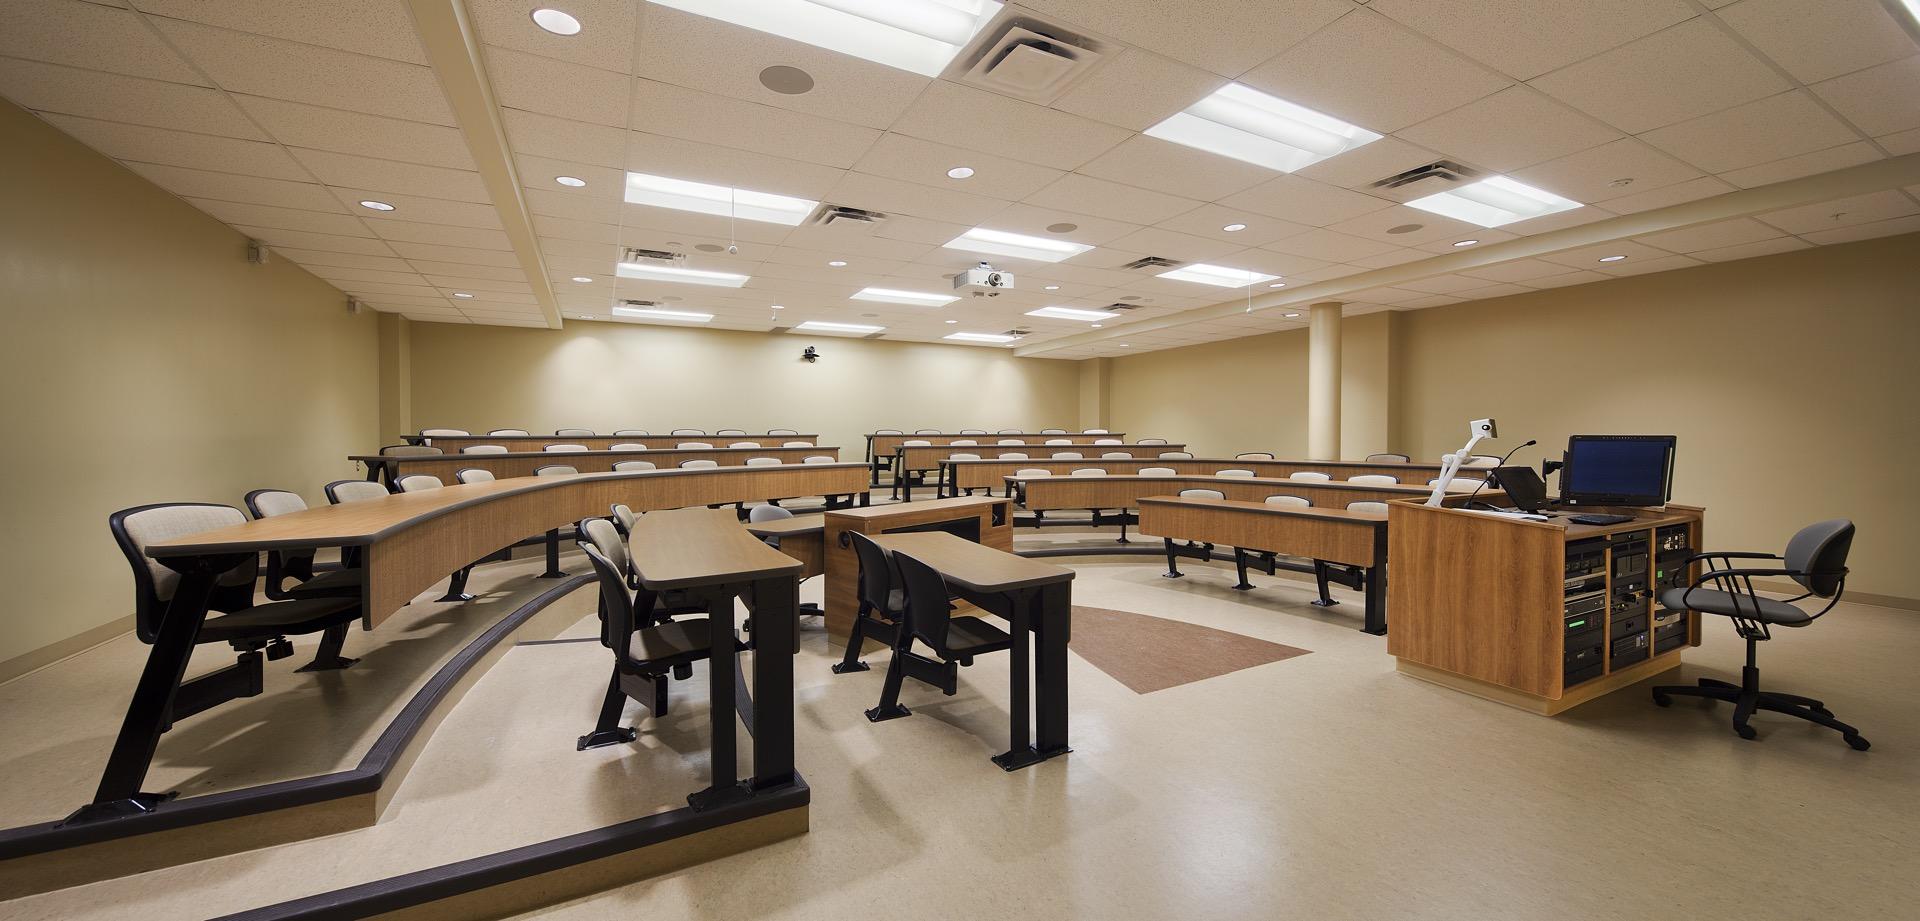 Odette School Of Business University Windsor